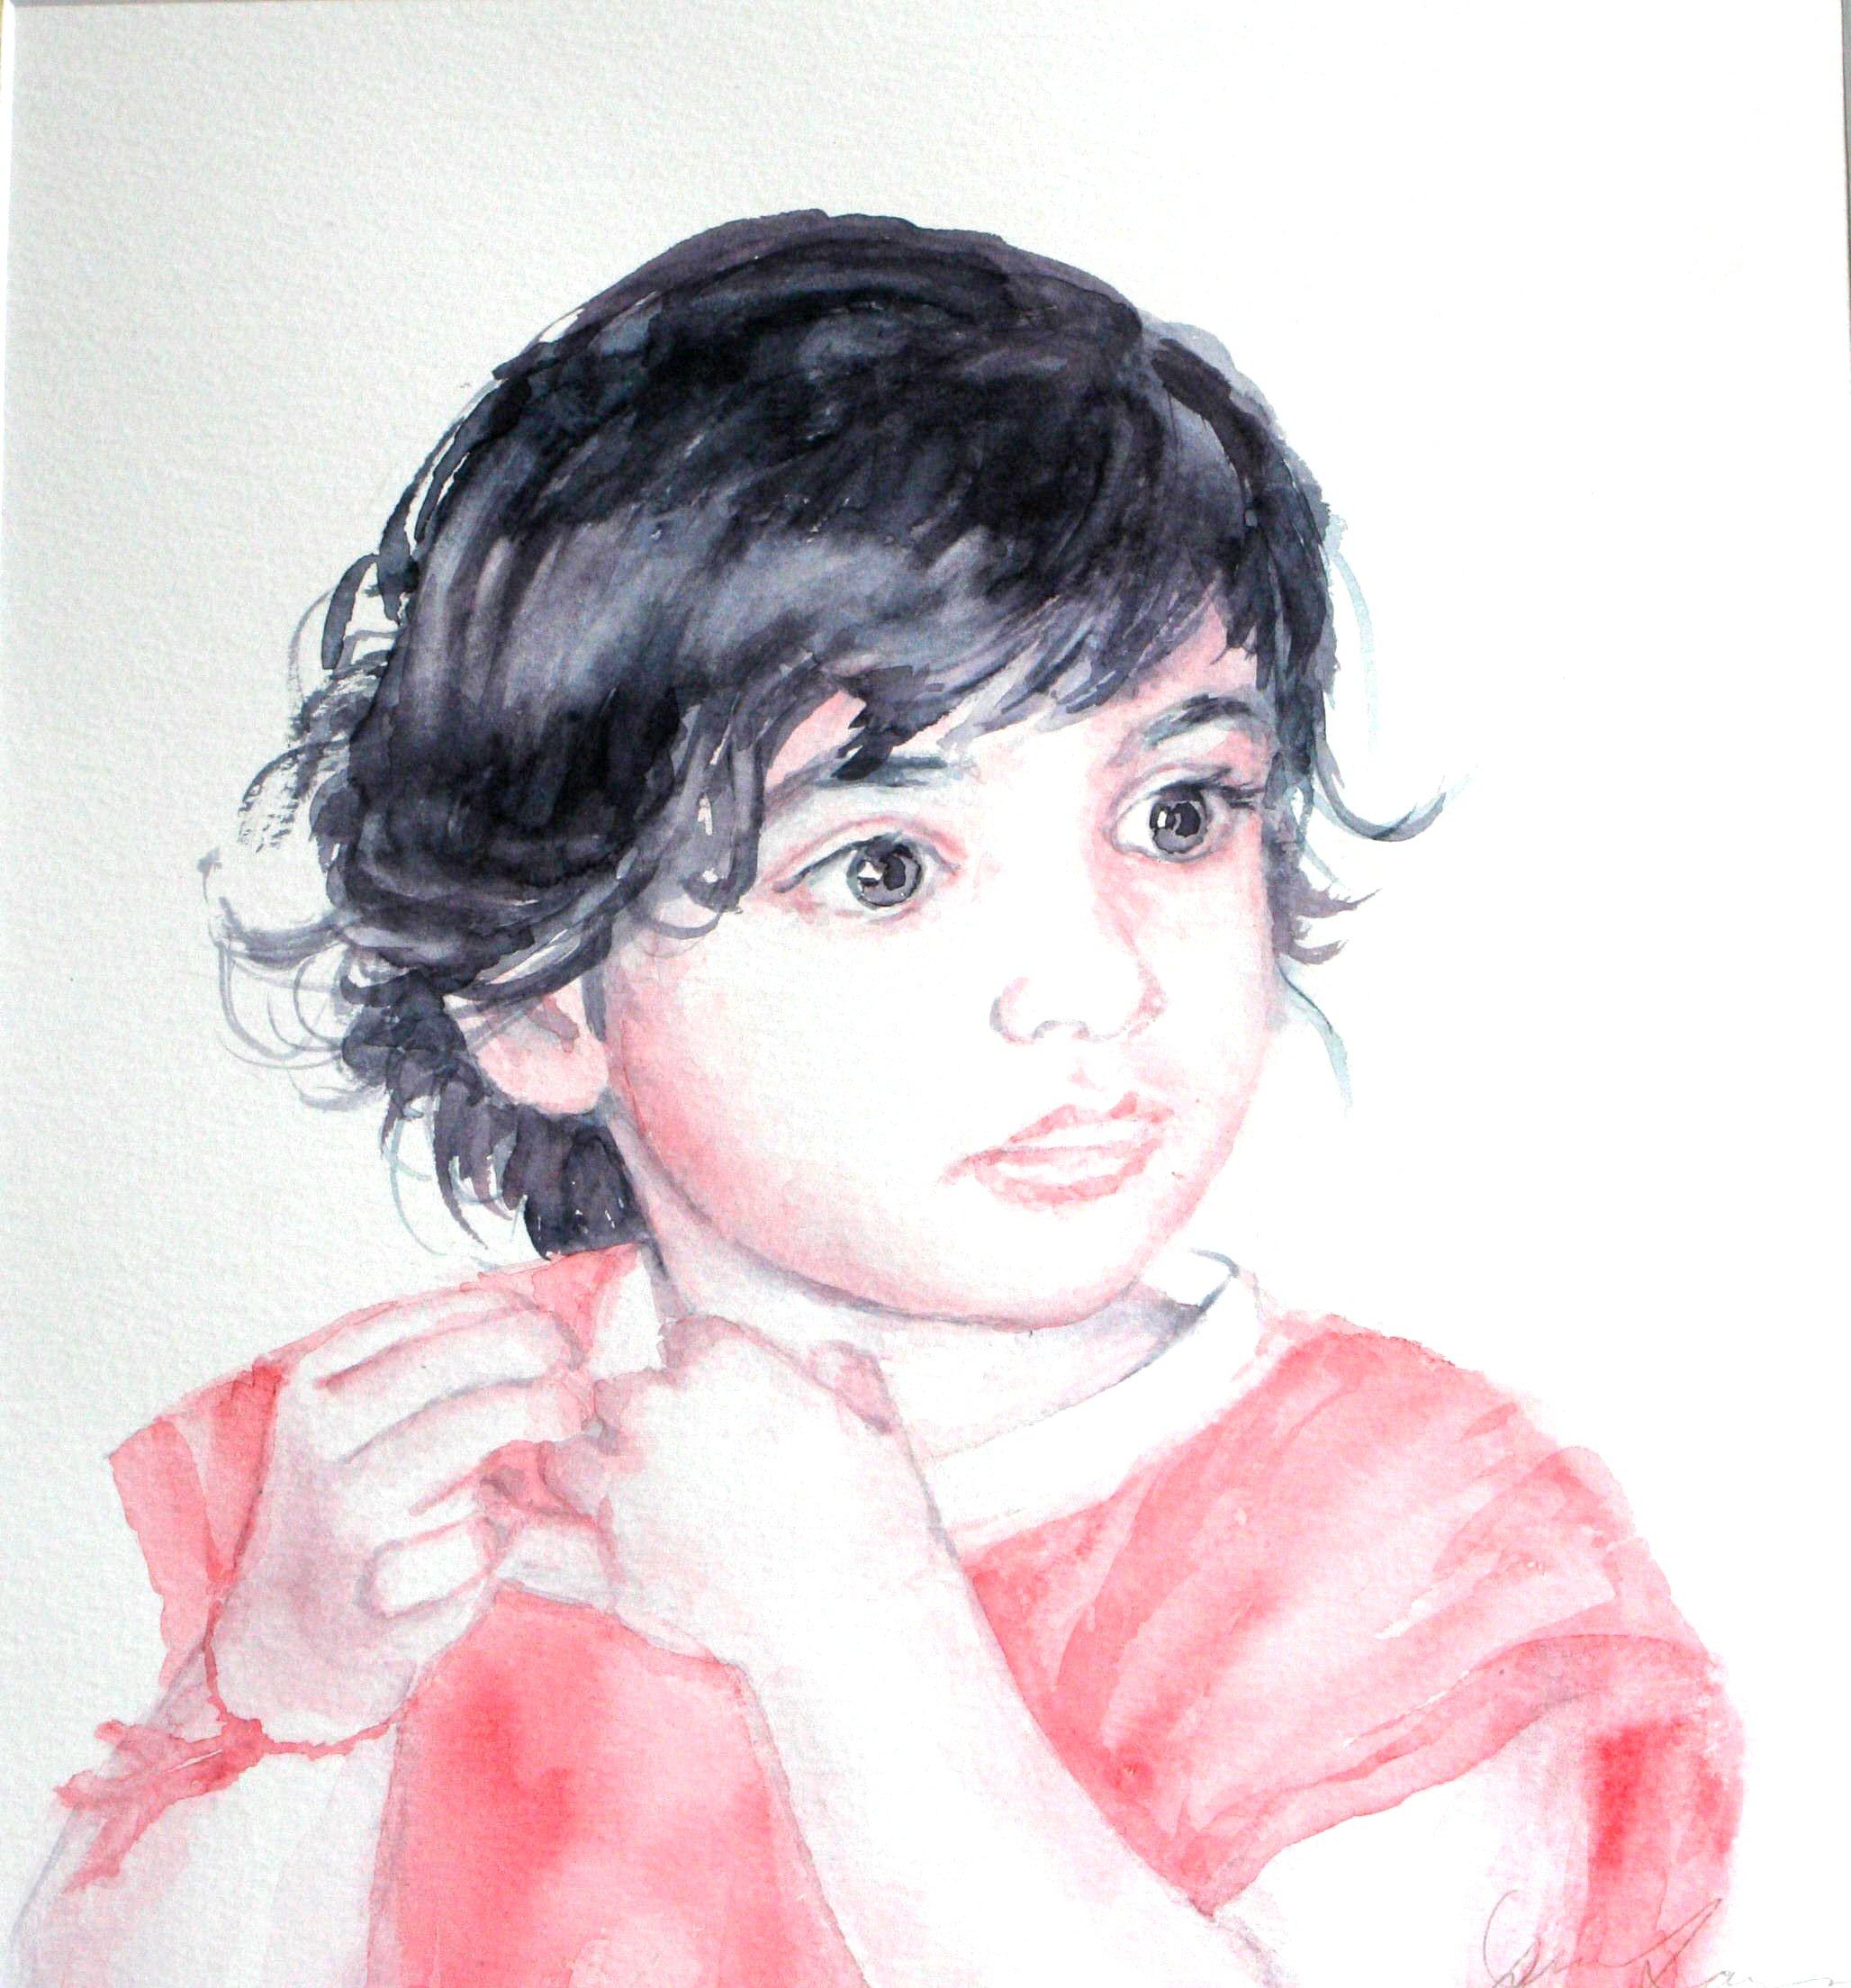 Anmol - Watercolour (28cmx31cm)